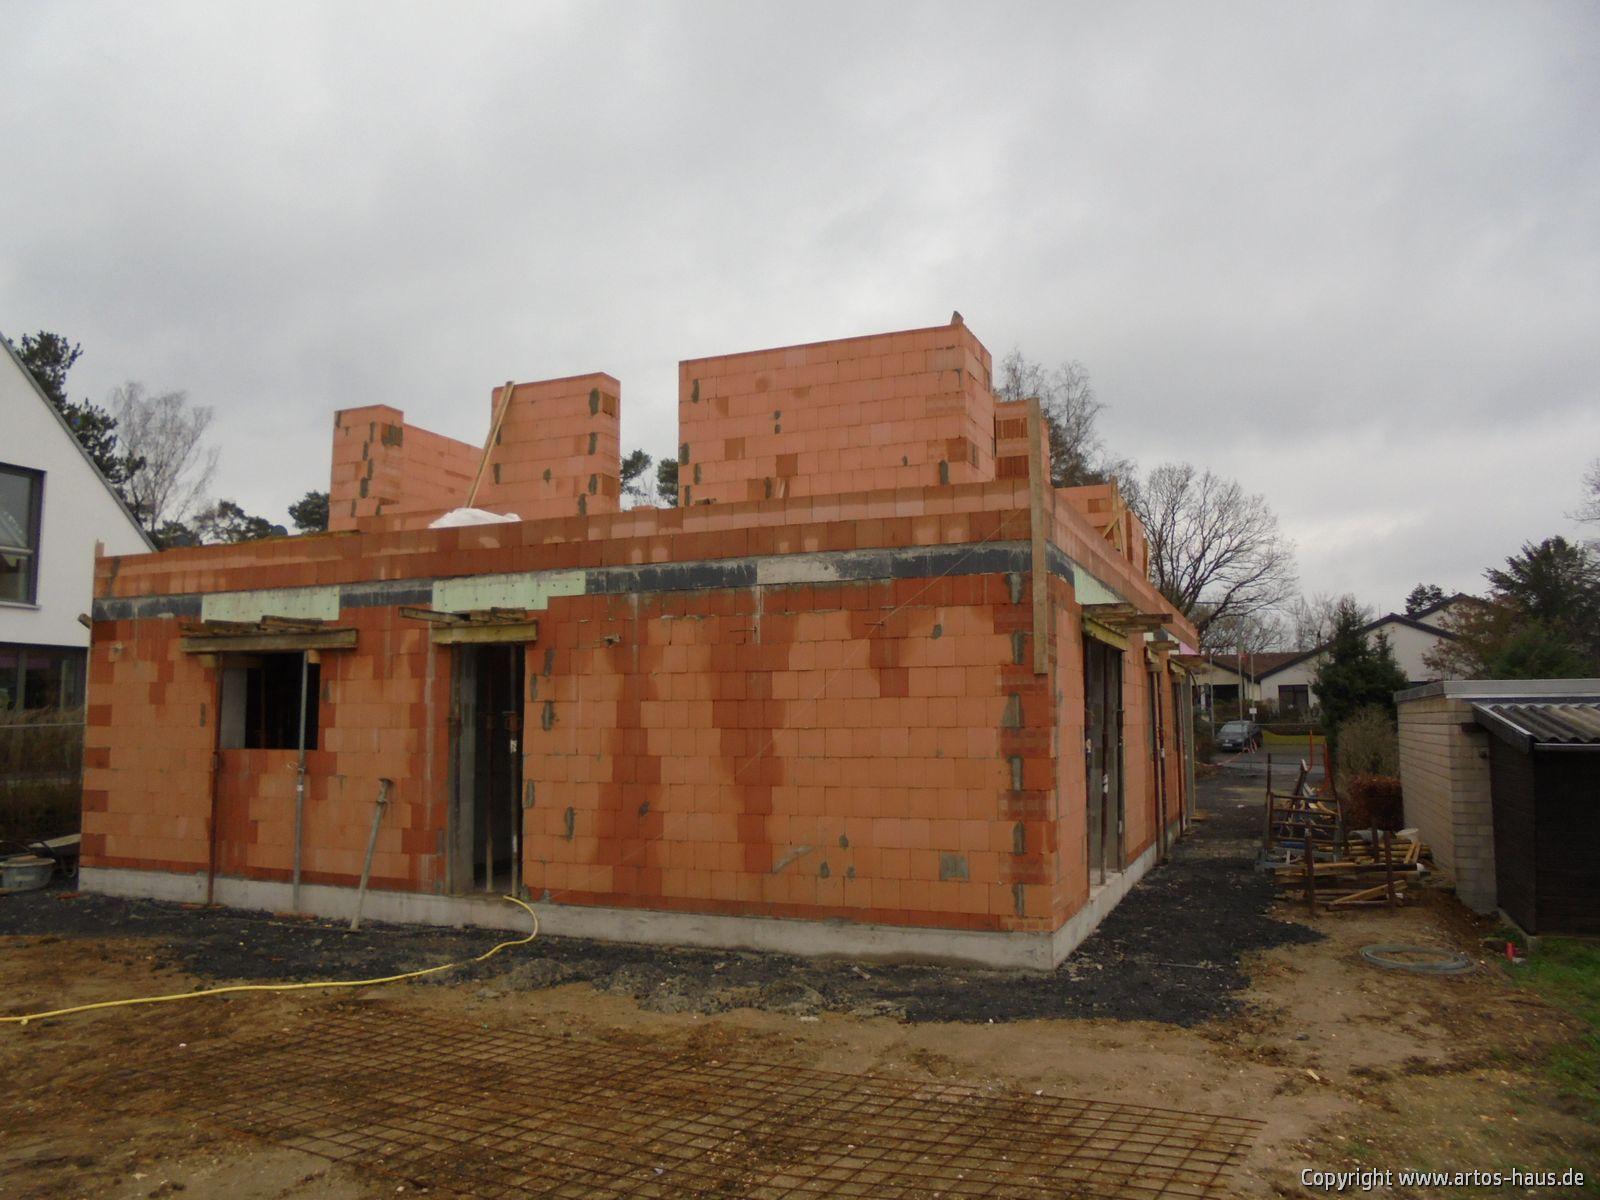 Rohbau der Baustelle in Bonn im Januar 2021 / ARTOS-HAUS Bild 3